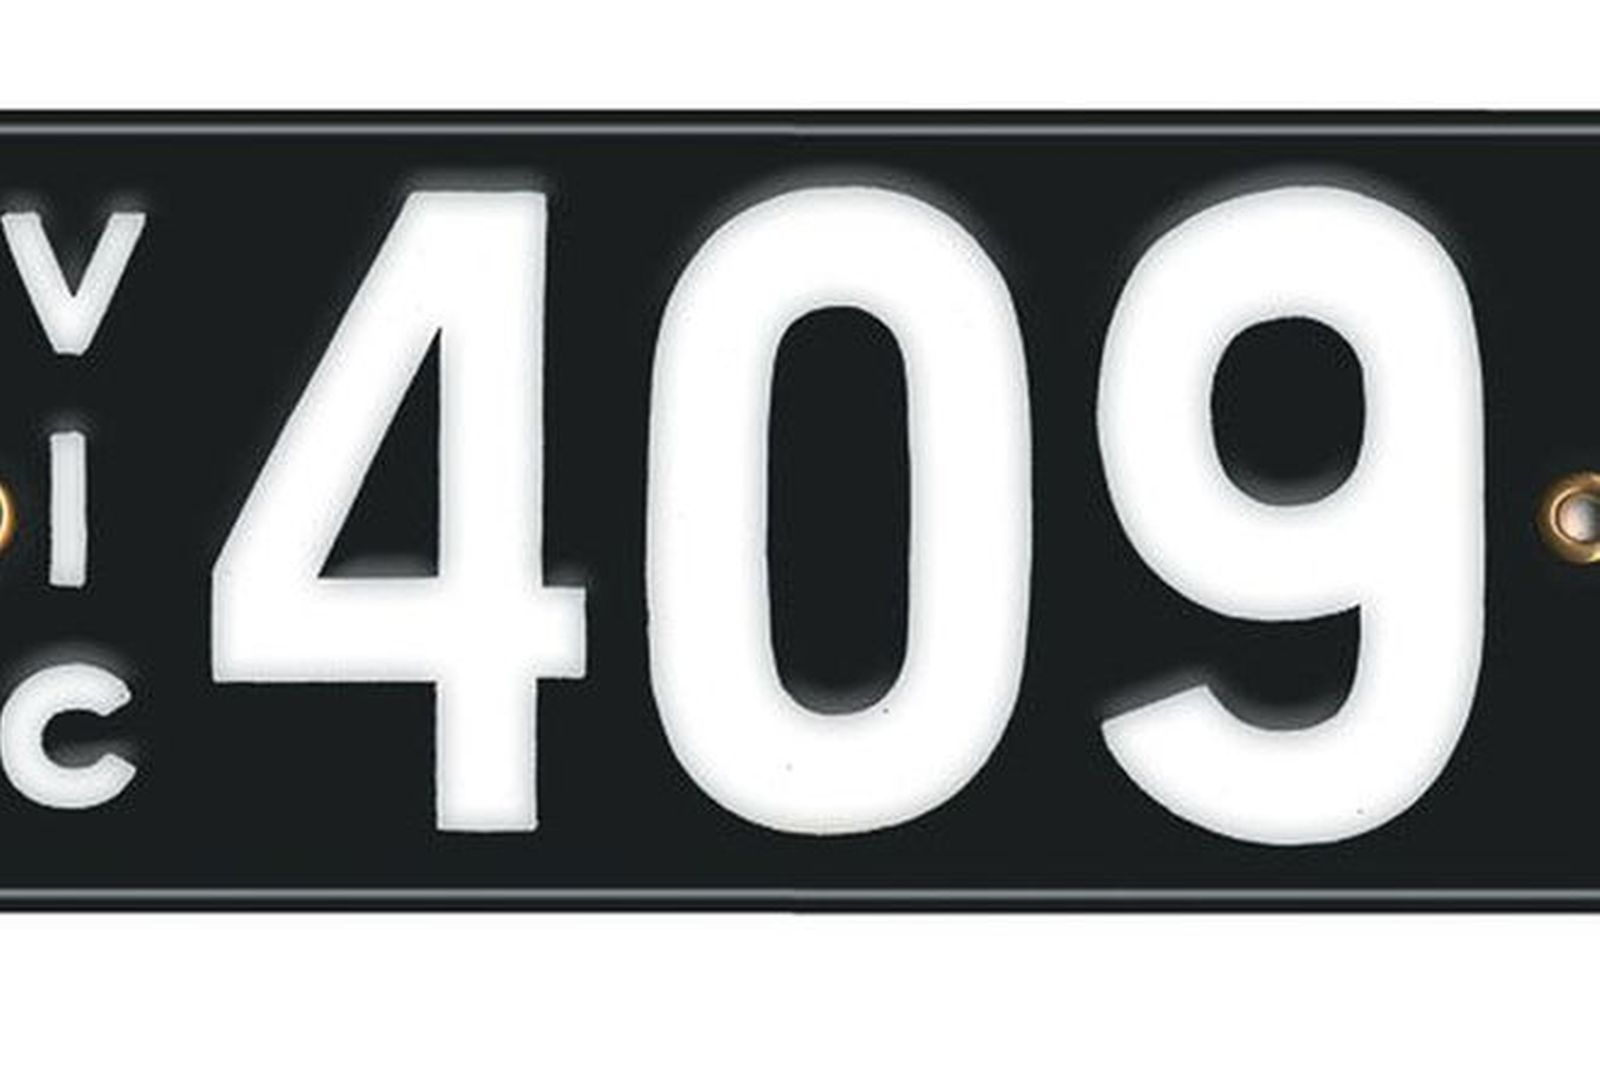 Victorian Vitreous Enamel Number Plates - '409'